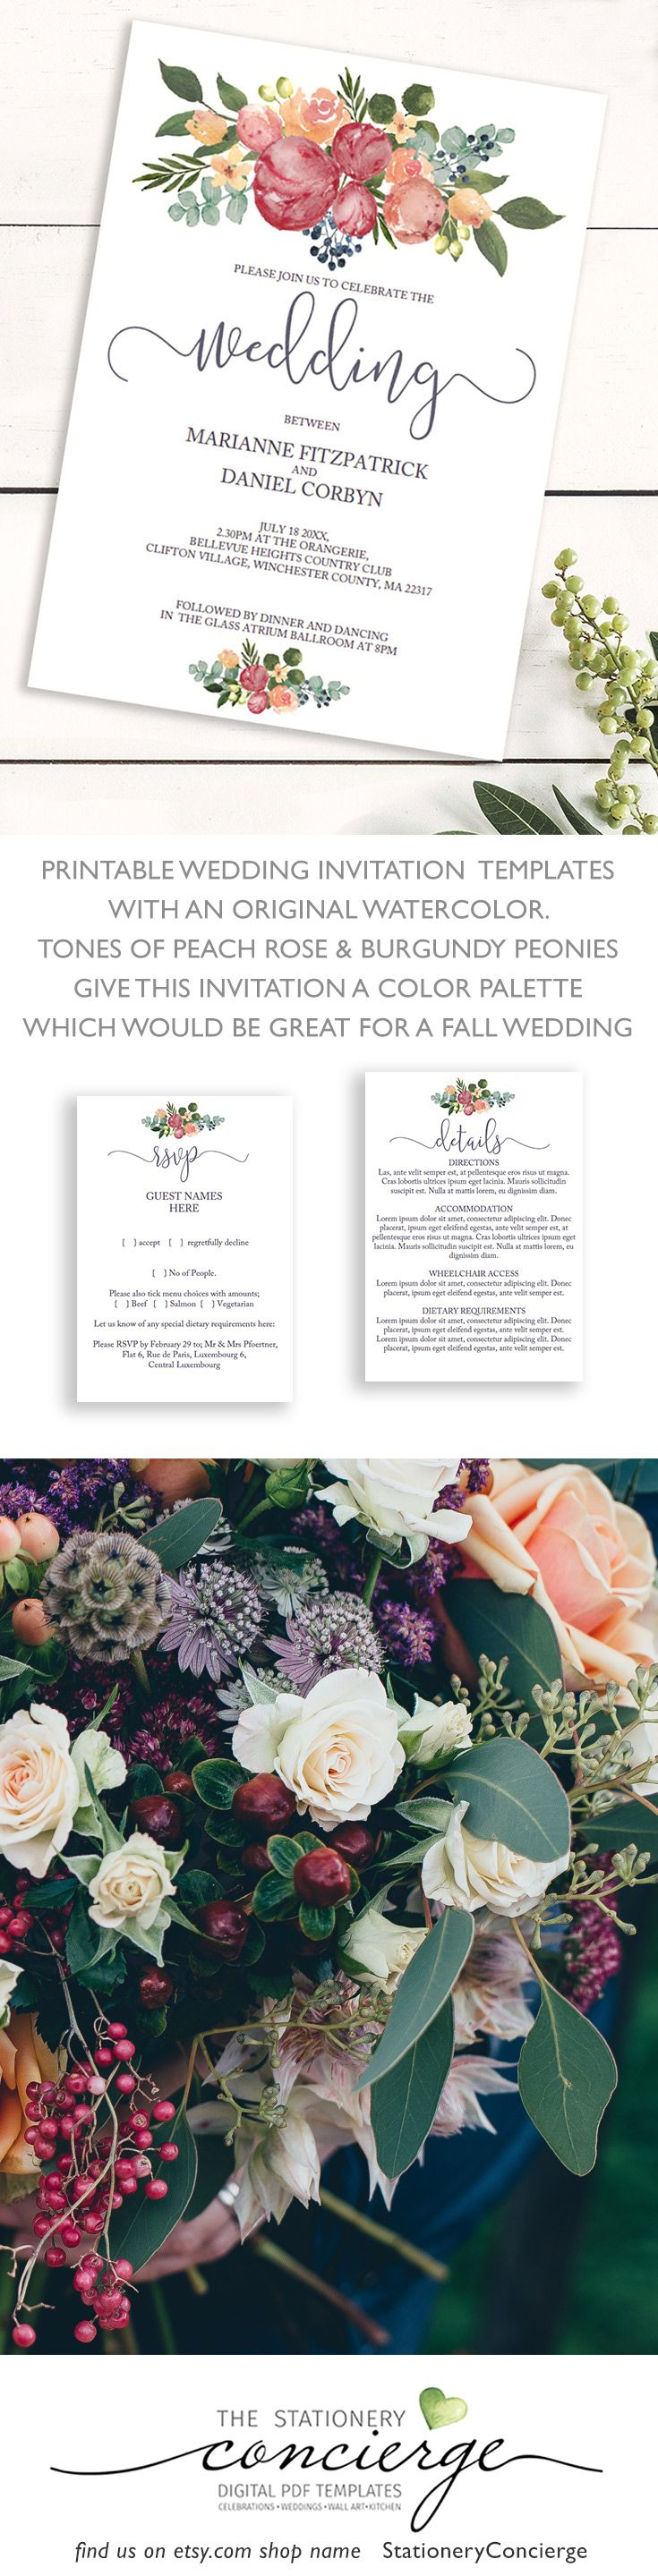 Best Wedding Templates Ideas Only On Pinterest Weddings